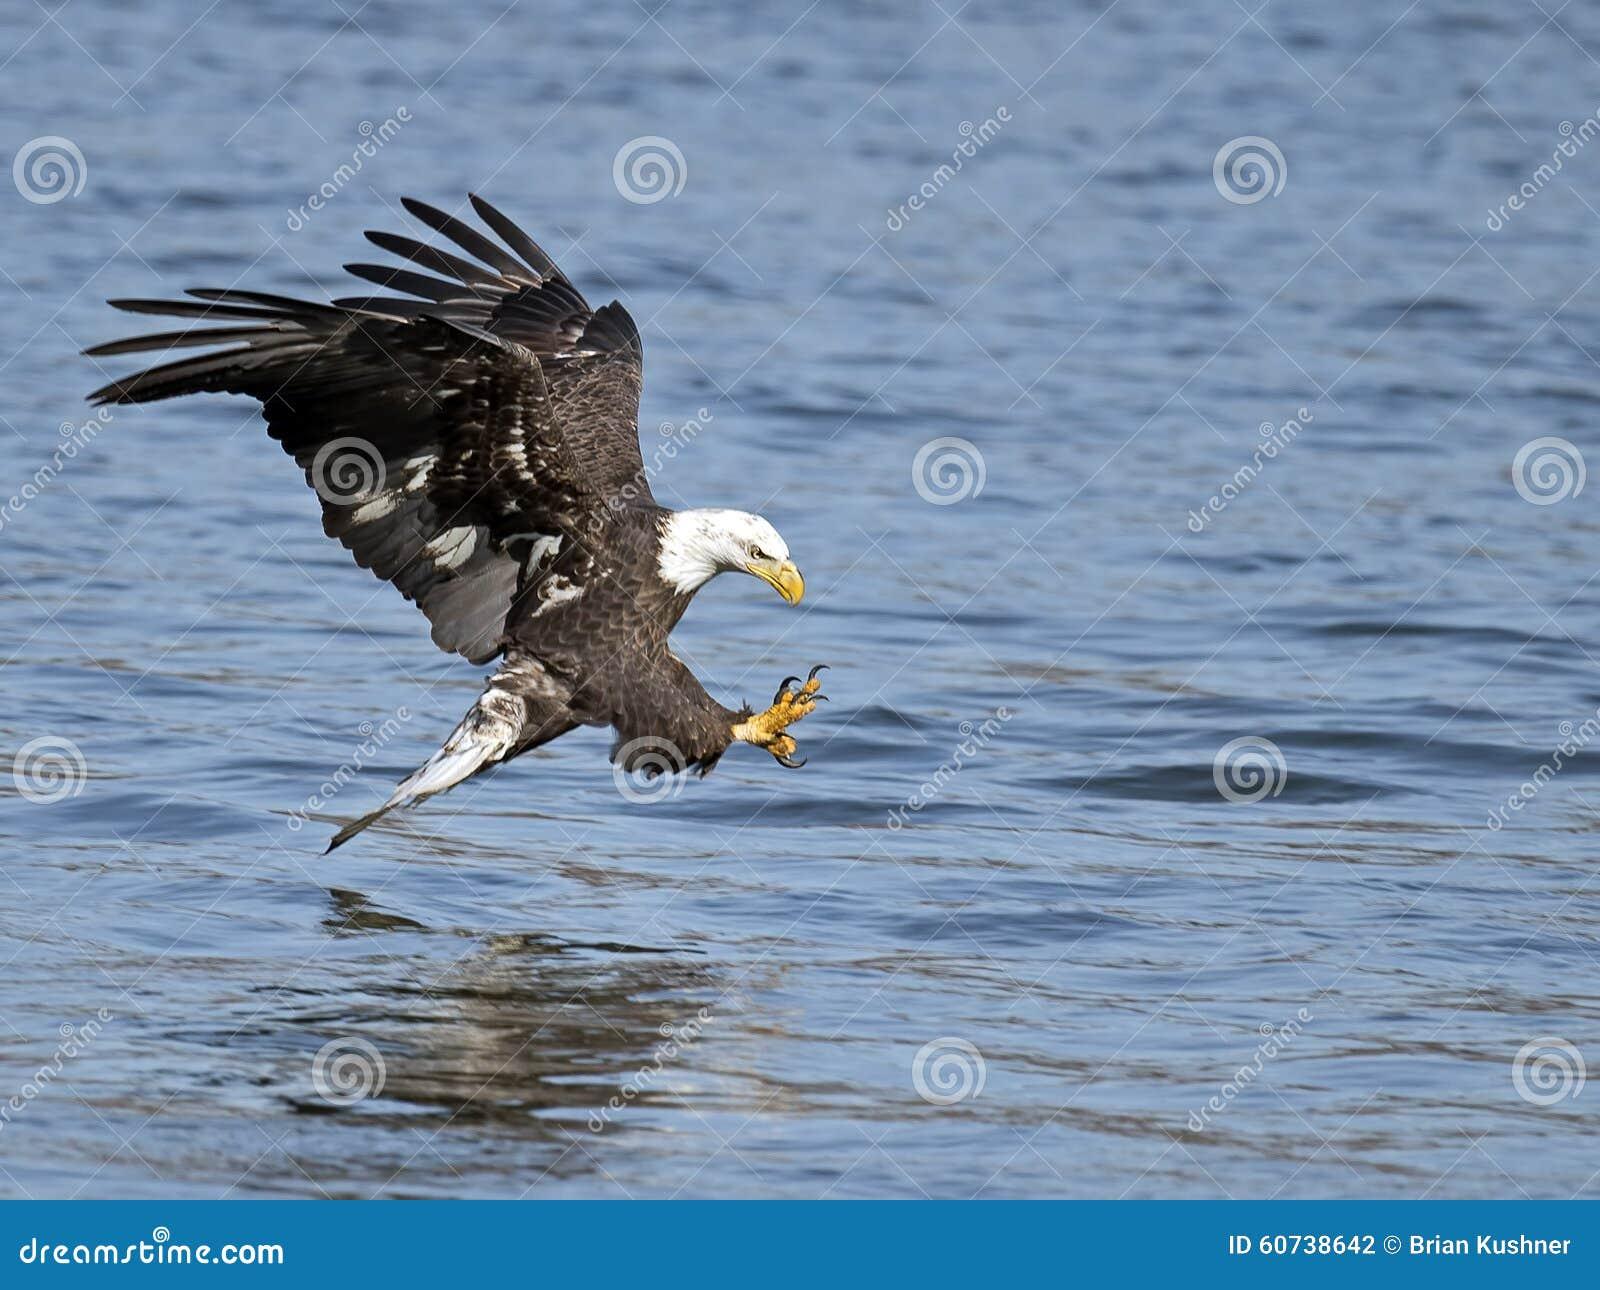 American Bald Eagle Fish Grab